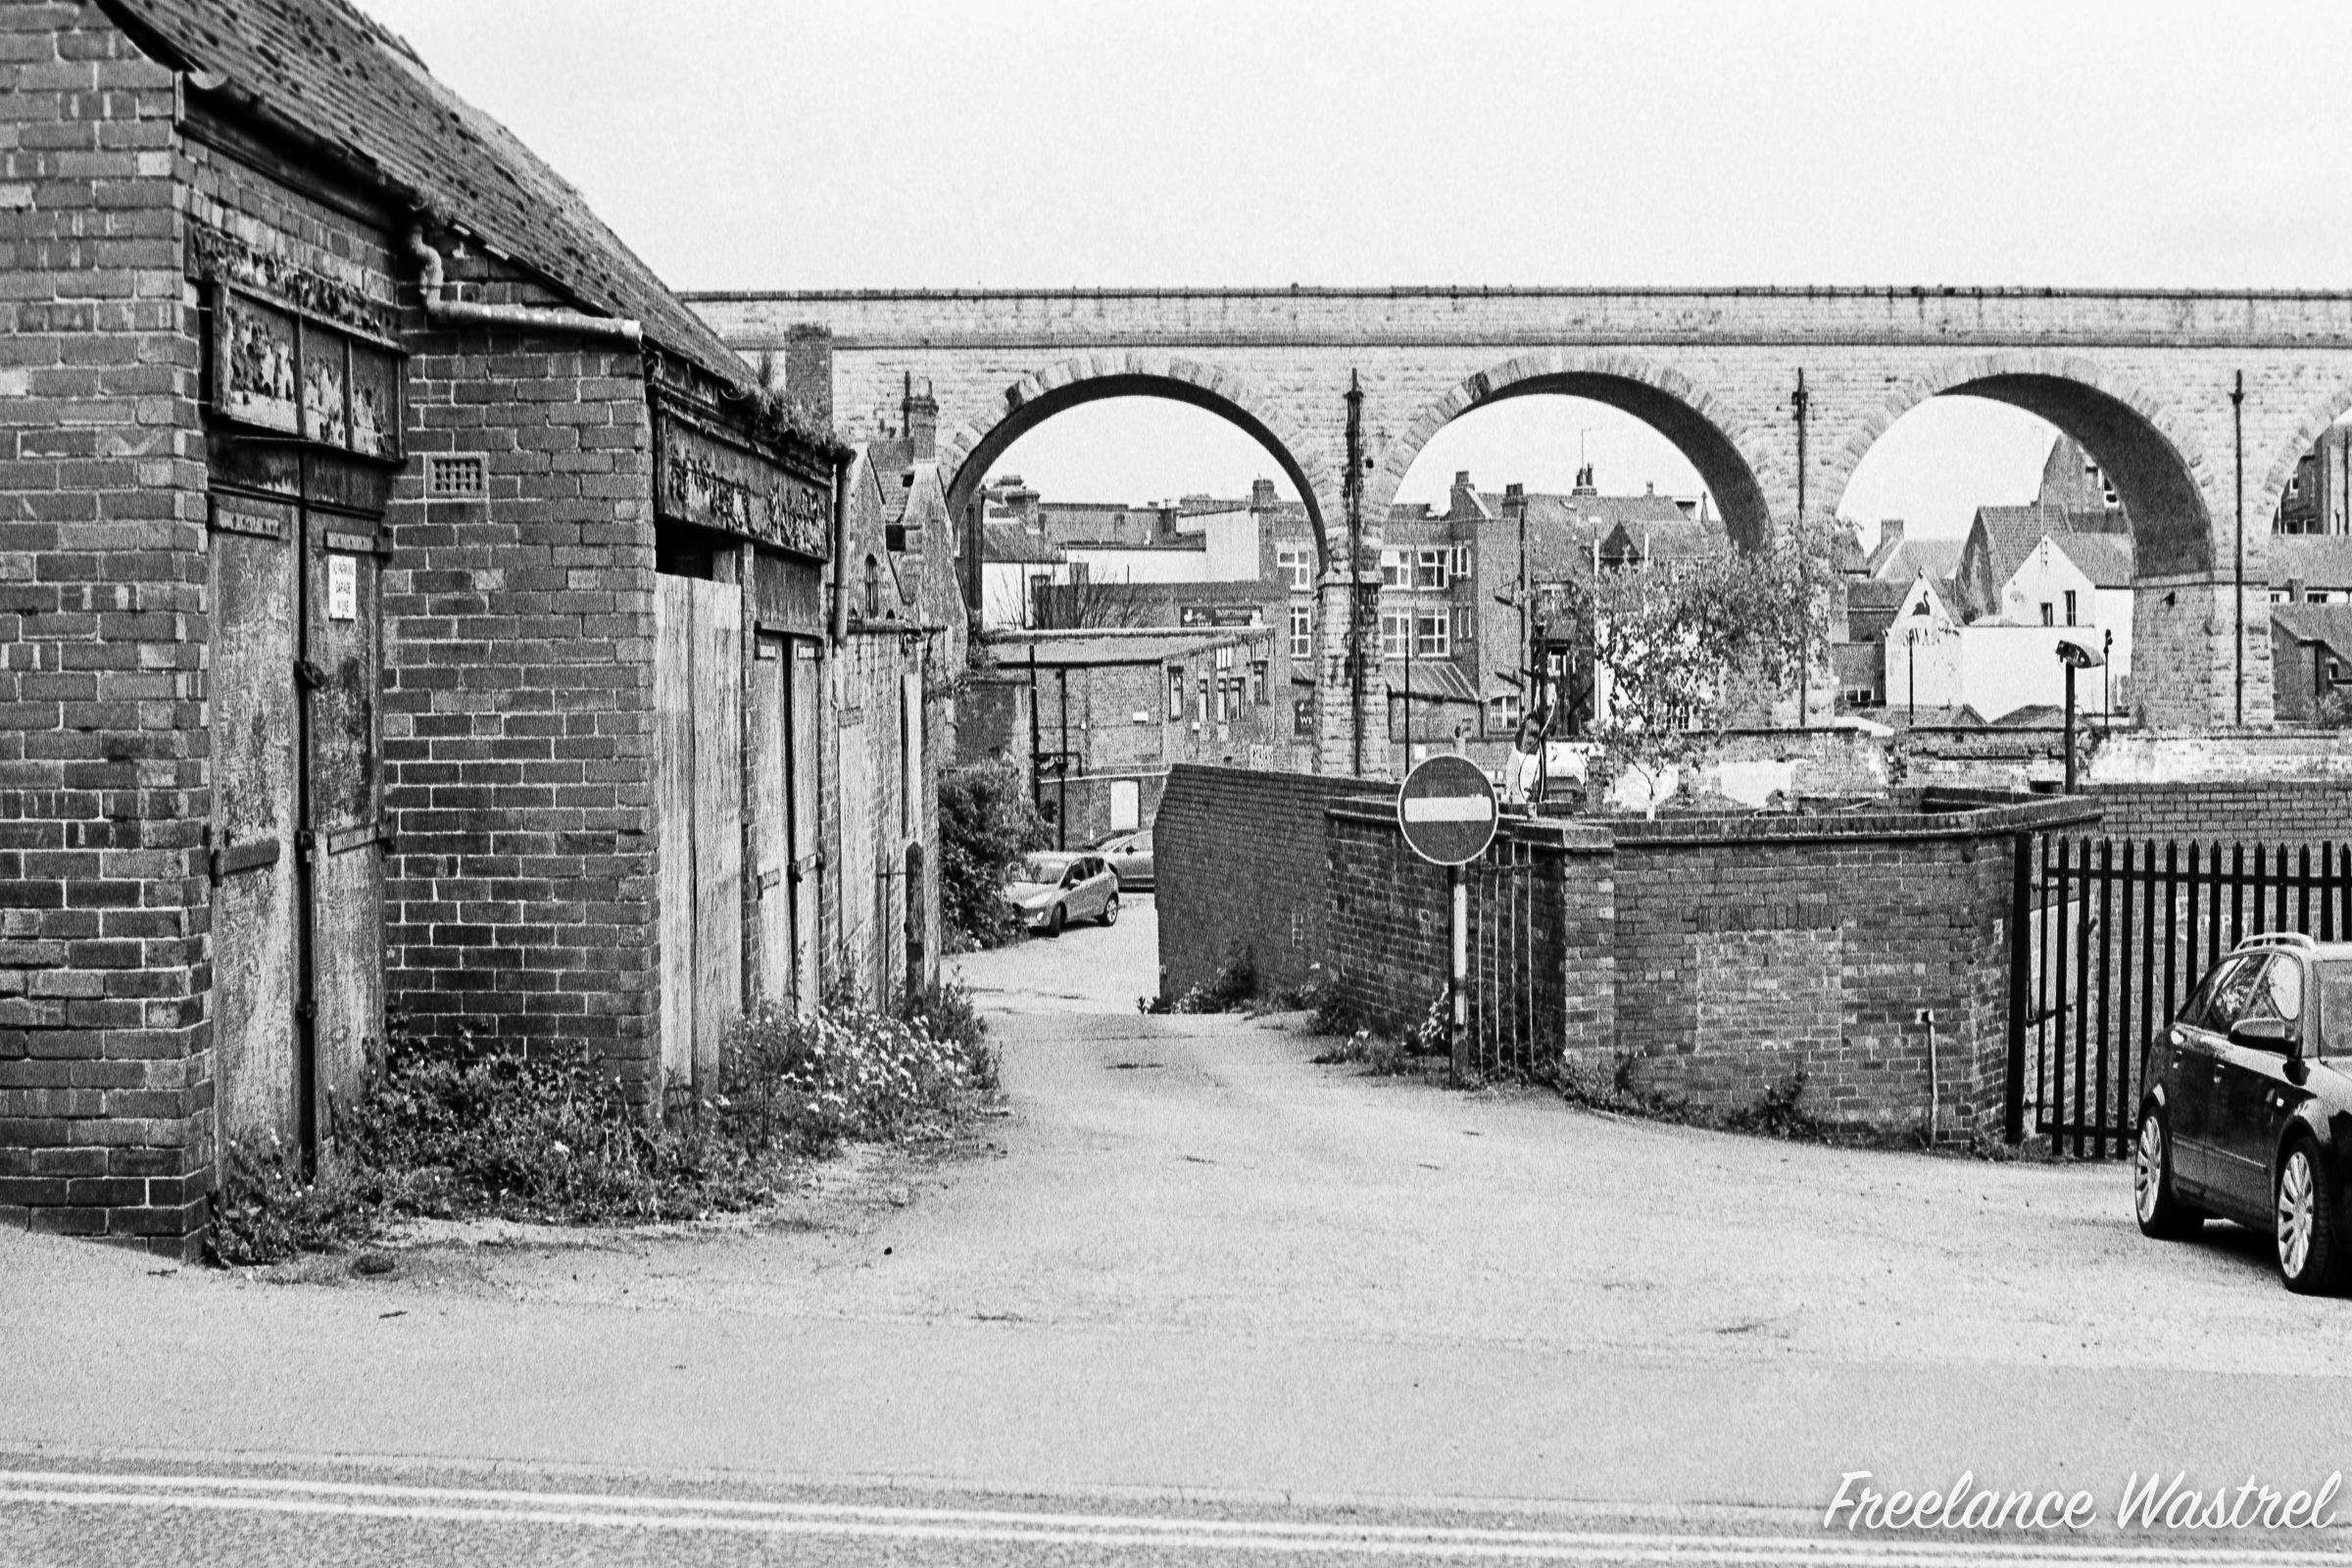 Mansfield Viaduct